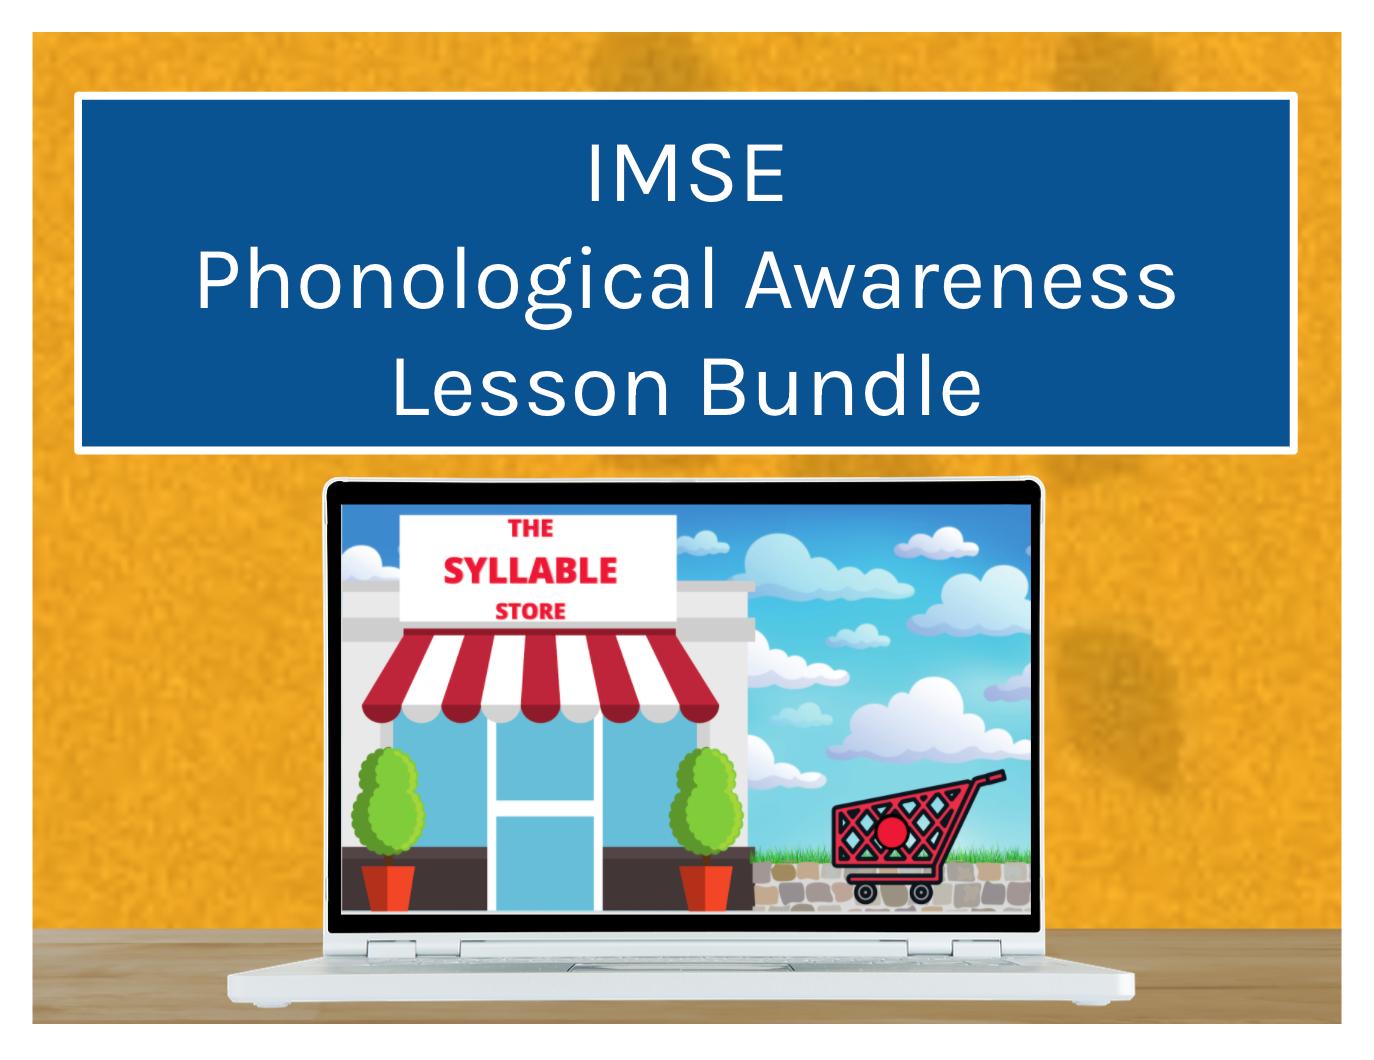 IMSE Phonological Awareness Lesson Bundle